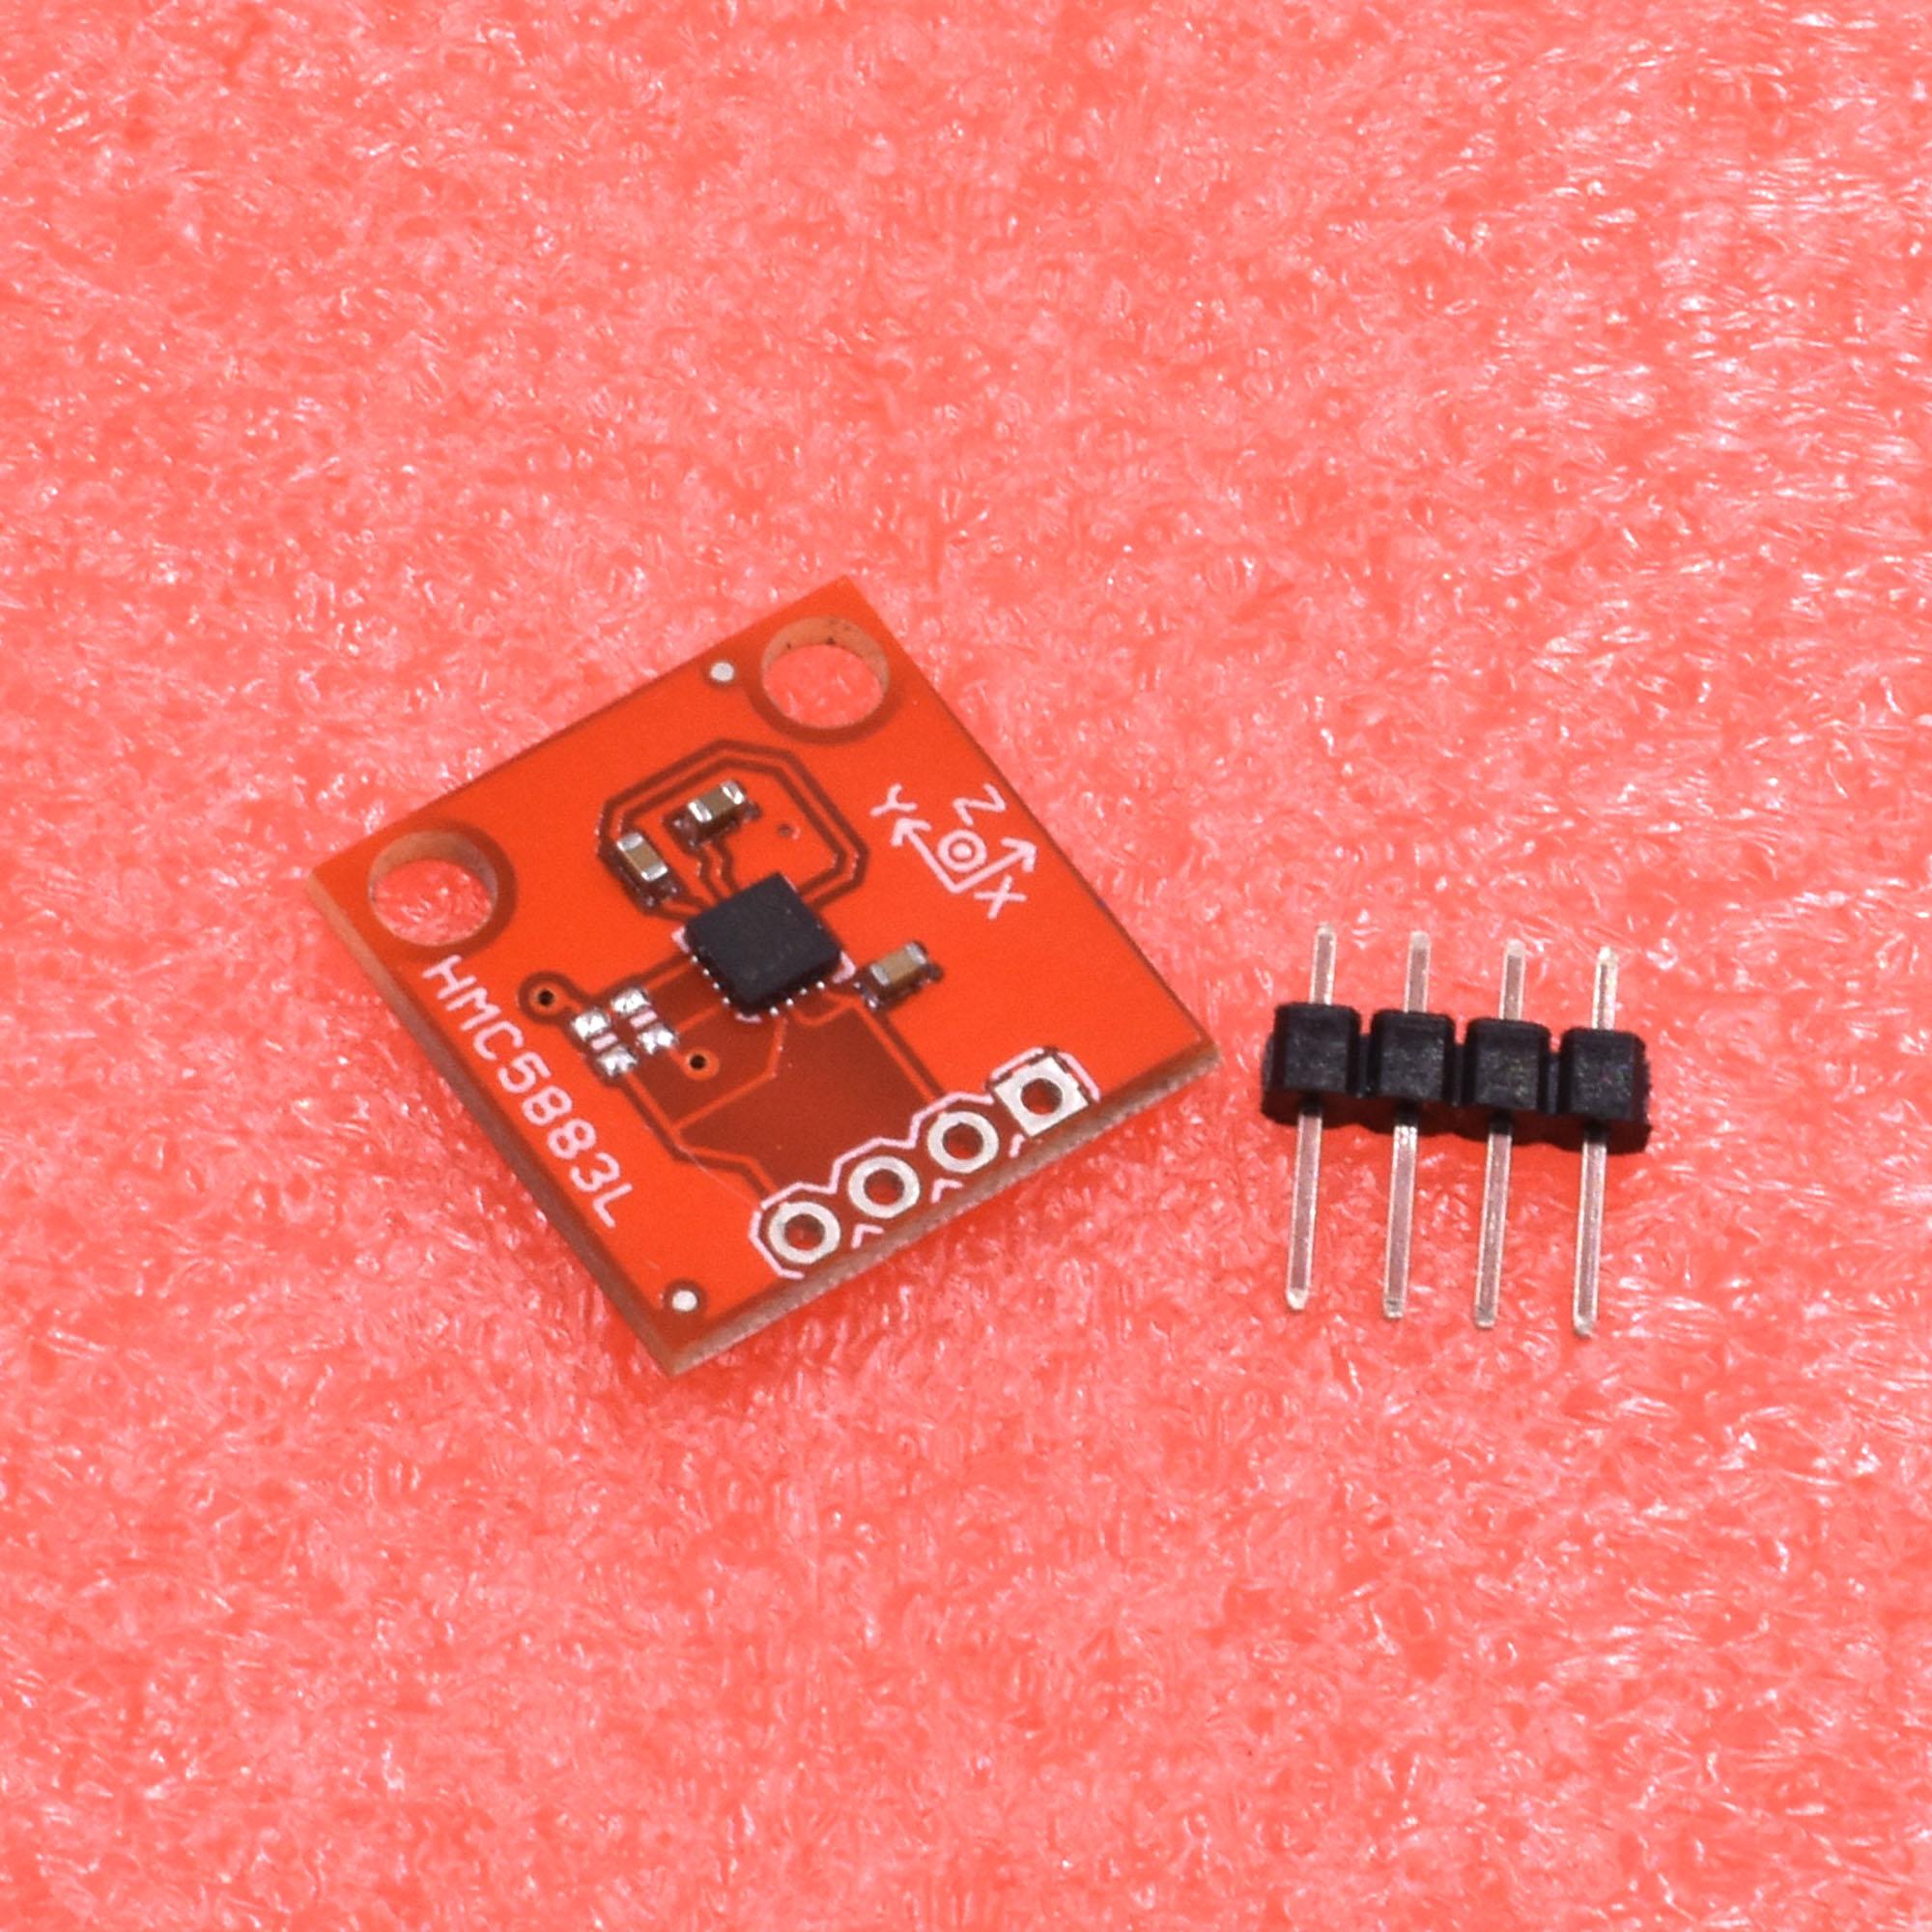 Details about DC3V-5V HMC5883L GY-271 GY-273 Triple Axis Compass Magnetomet  Sensor Arduino